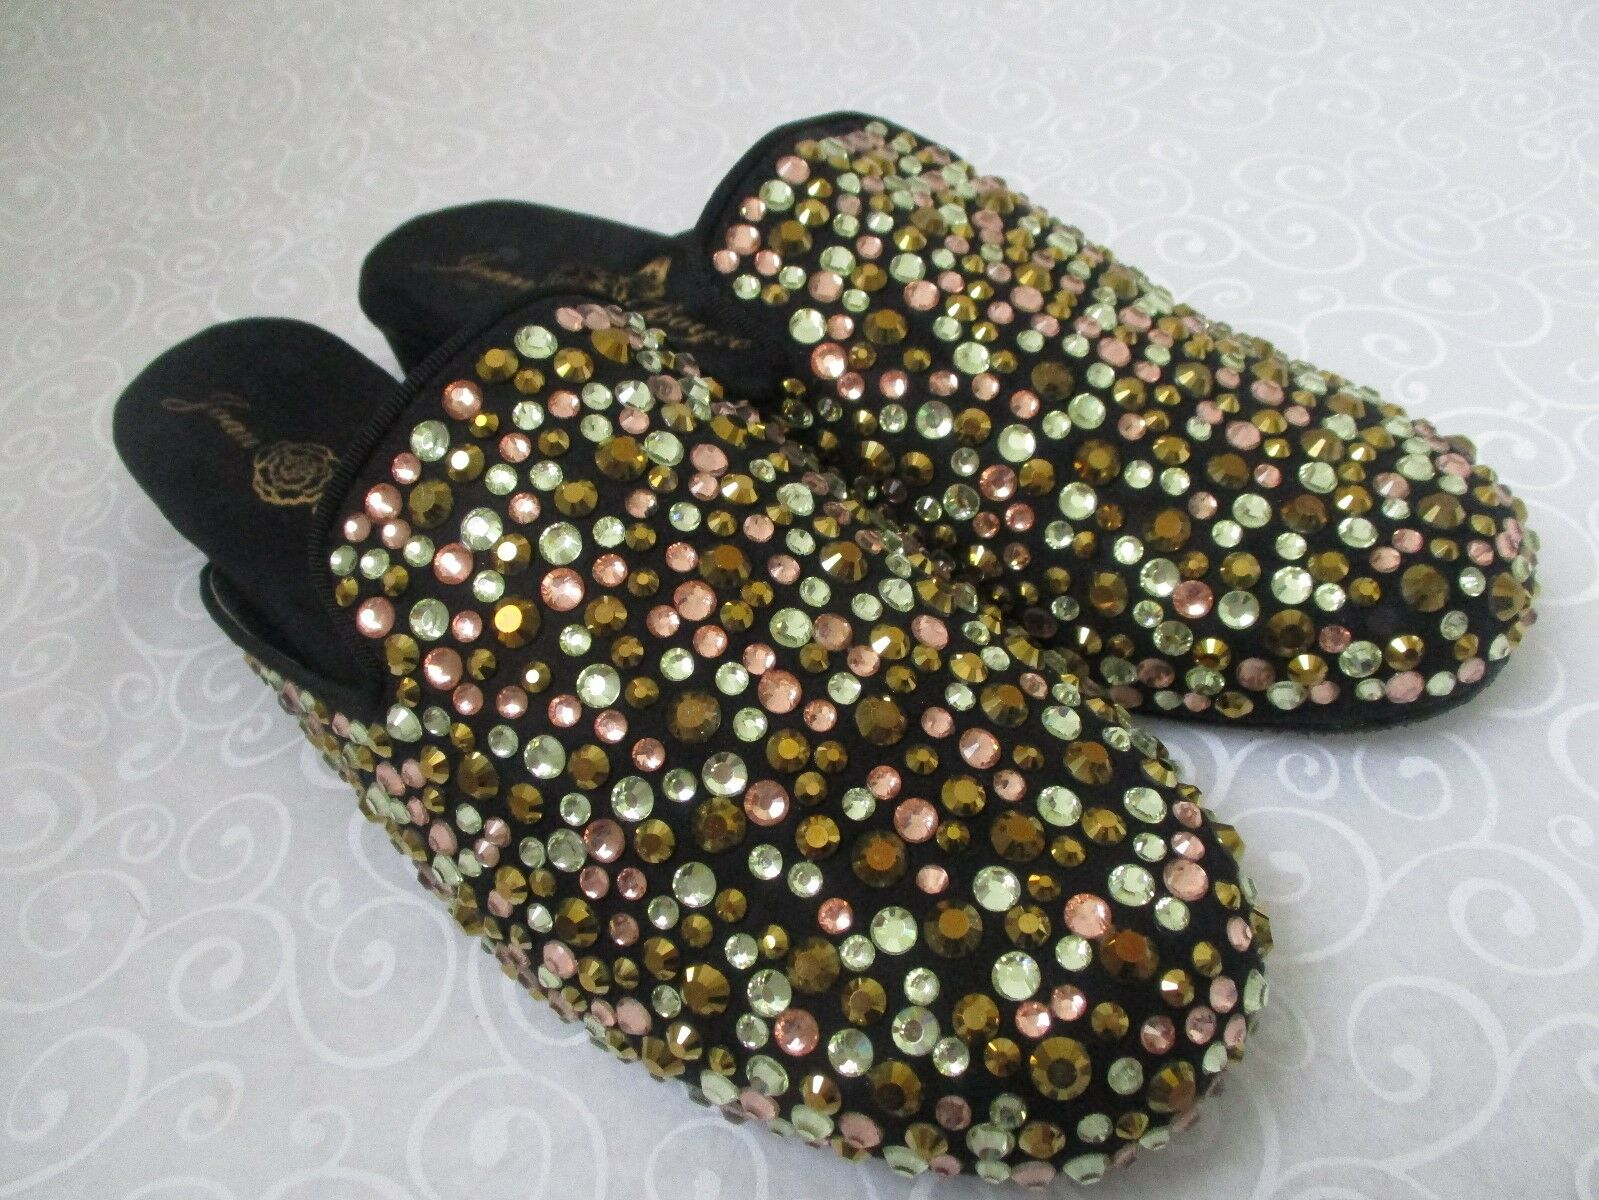 JOAN BOYCE SIZE MULTI-COLOR RHINESTONE SLIDES Schuhe SIZE BOYCE 8 1/2 M - NEW d4504b